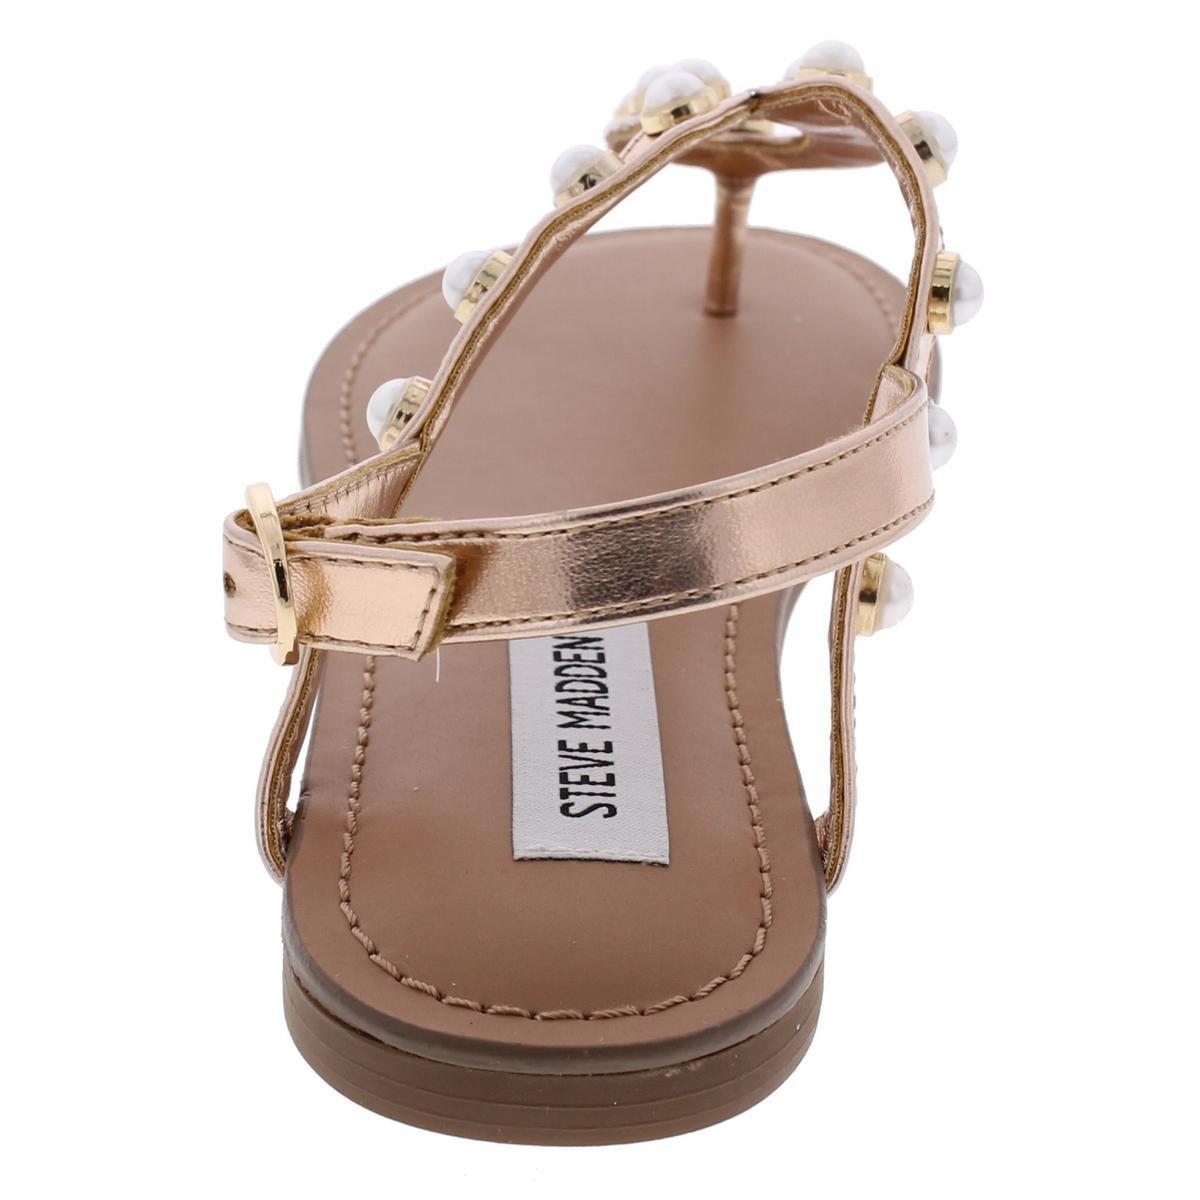 c7da52ab58438 Amazon.com: STEVE MADDEN HIDEAWAYP ROSE GOLD LEATHER: Shoes